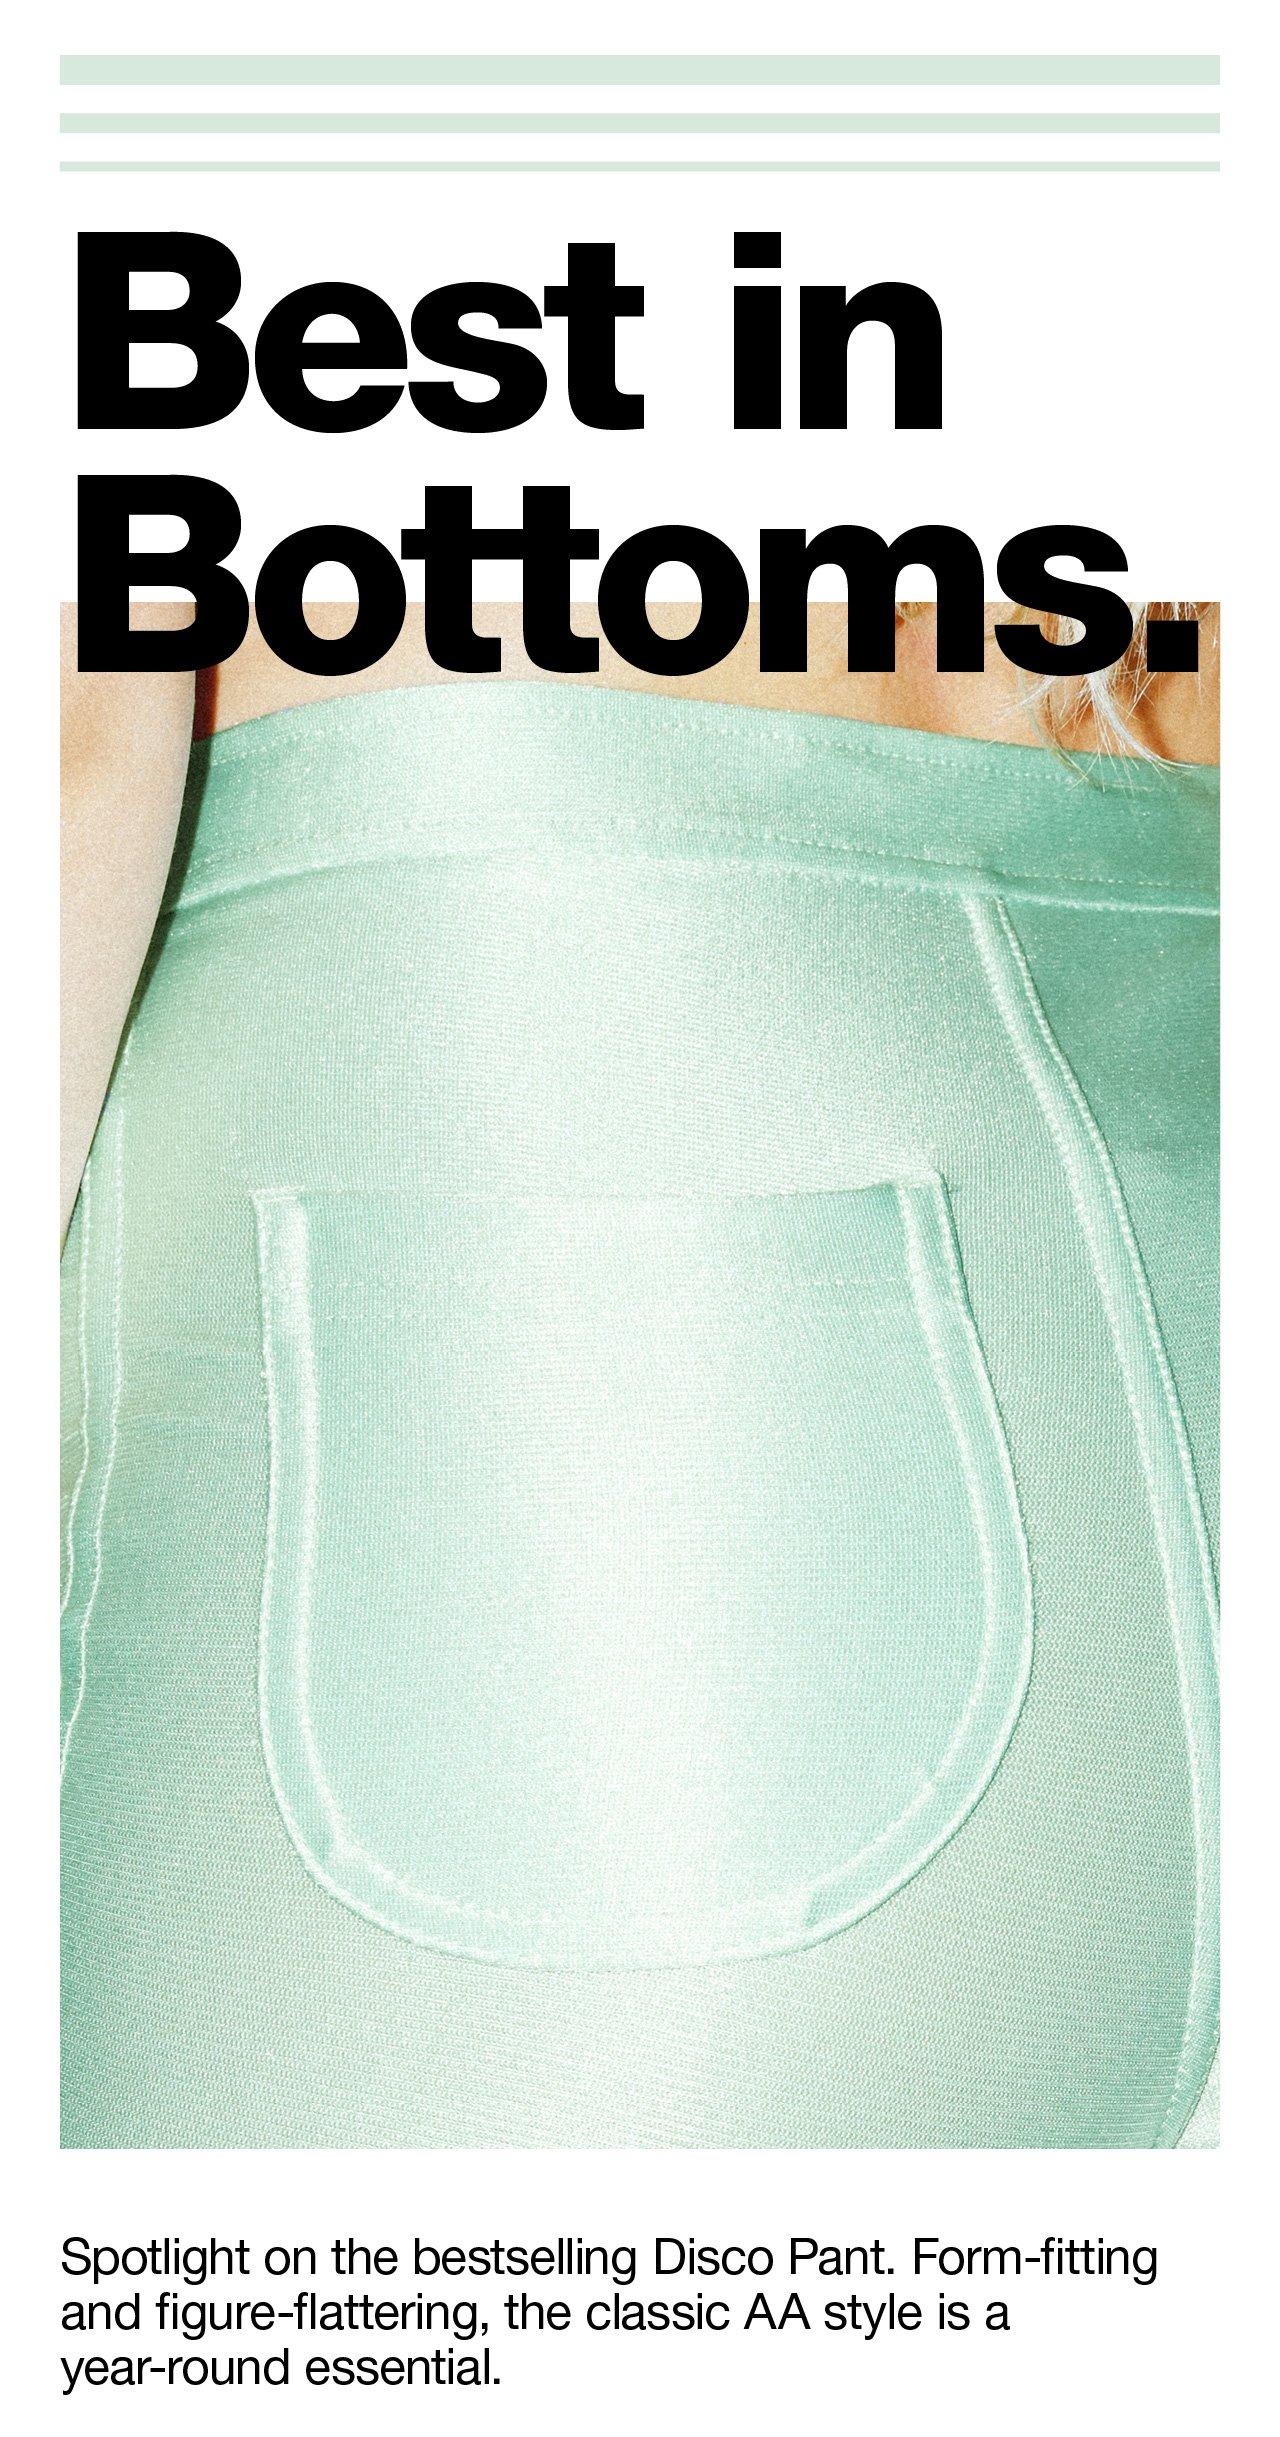 Best In Bottoms